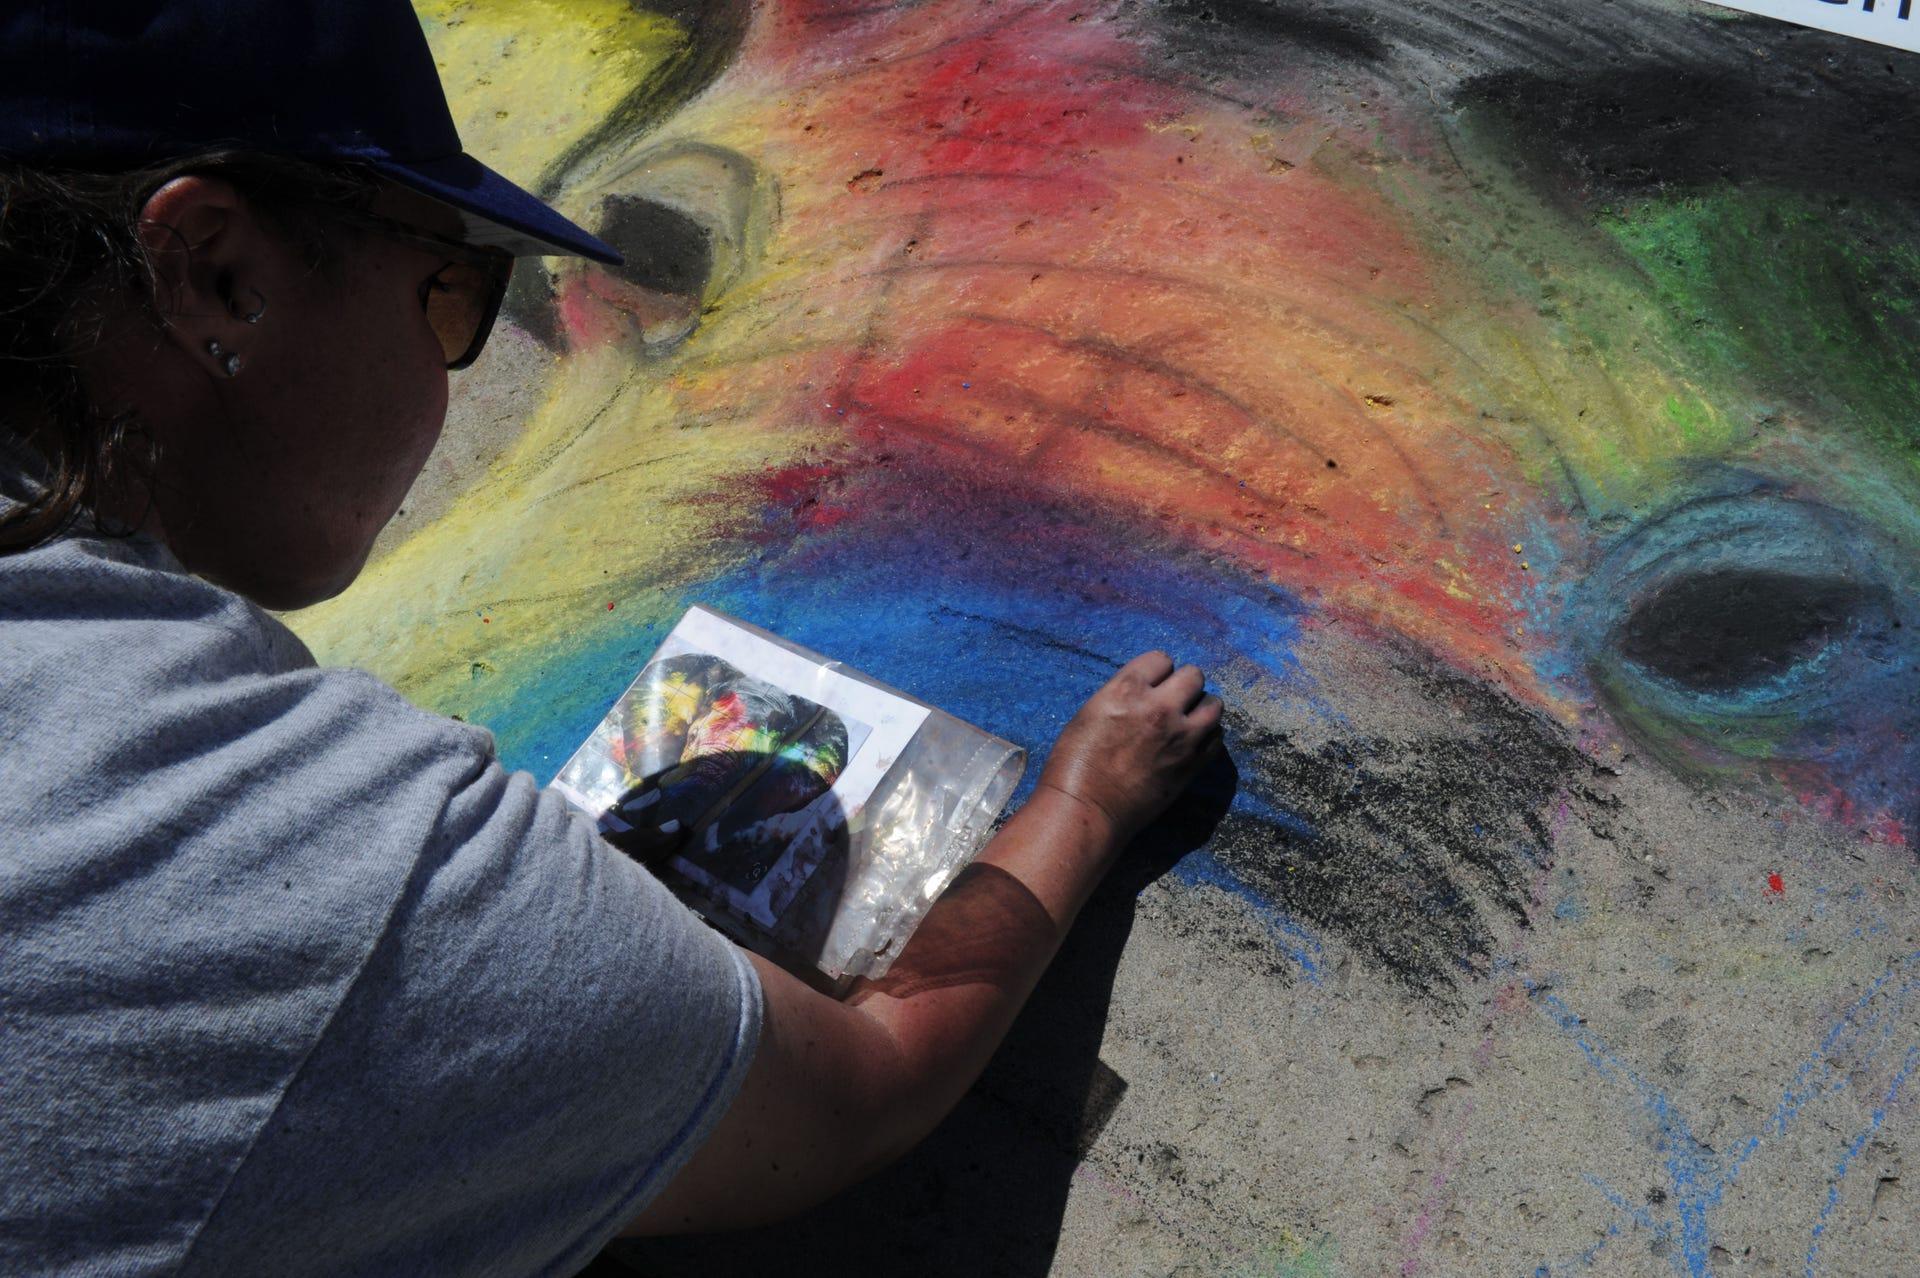 Ventura Art Street Painting Festival Brings Artists To